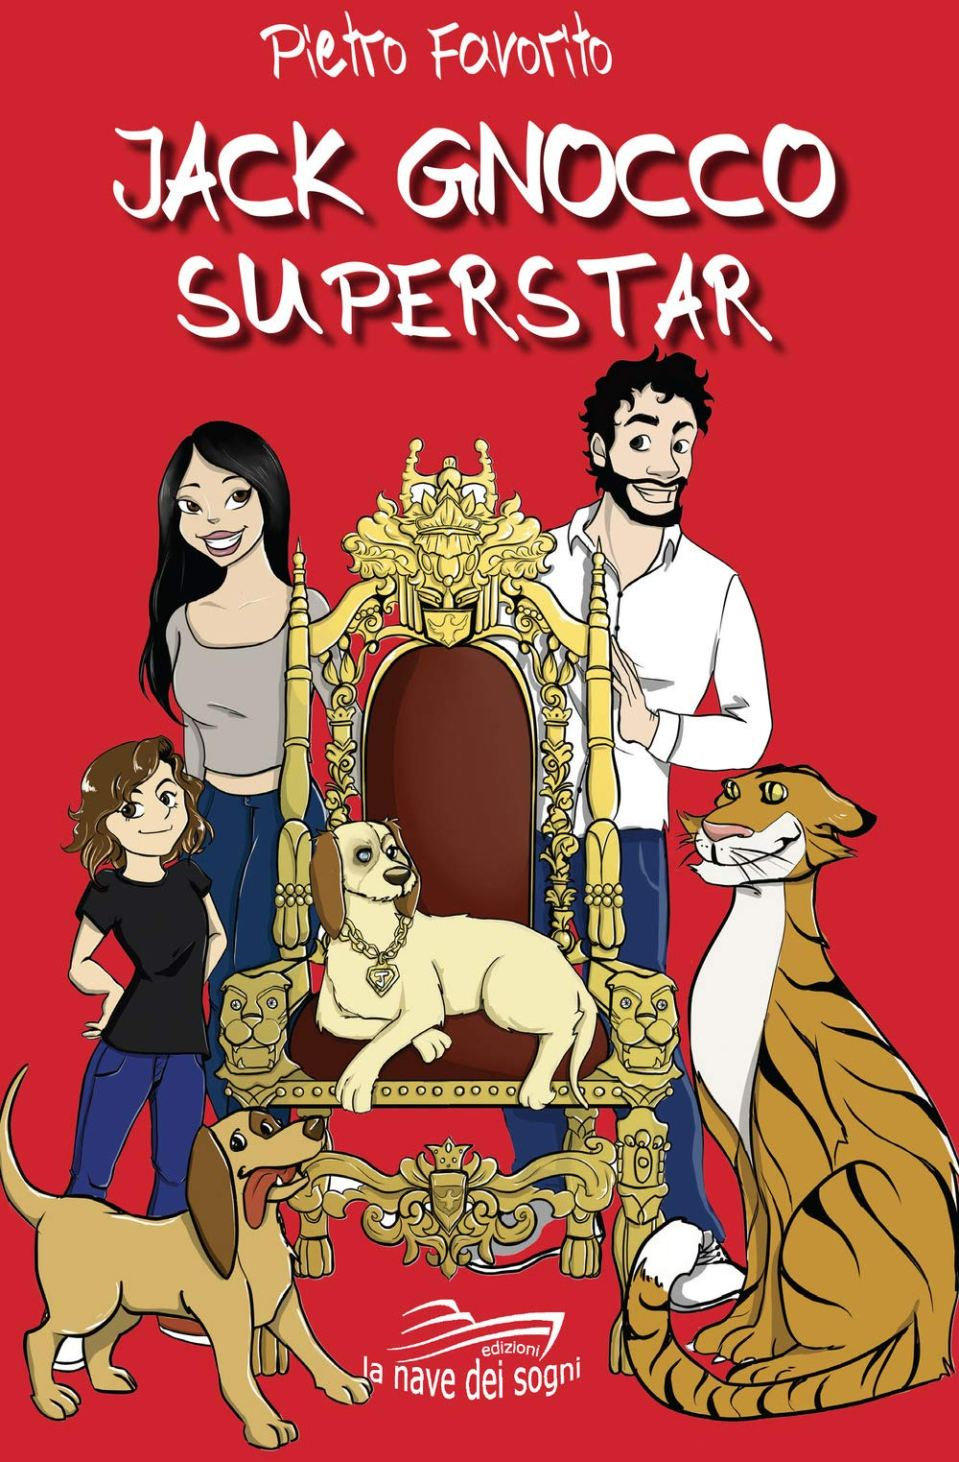 Jack Gnocco Superstar Book Cover